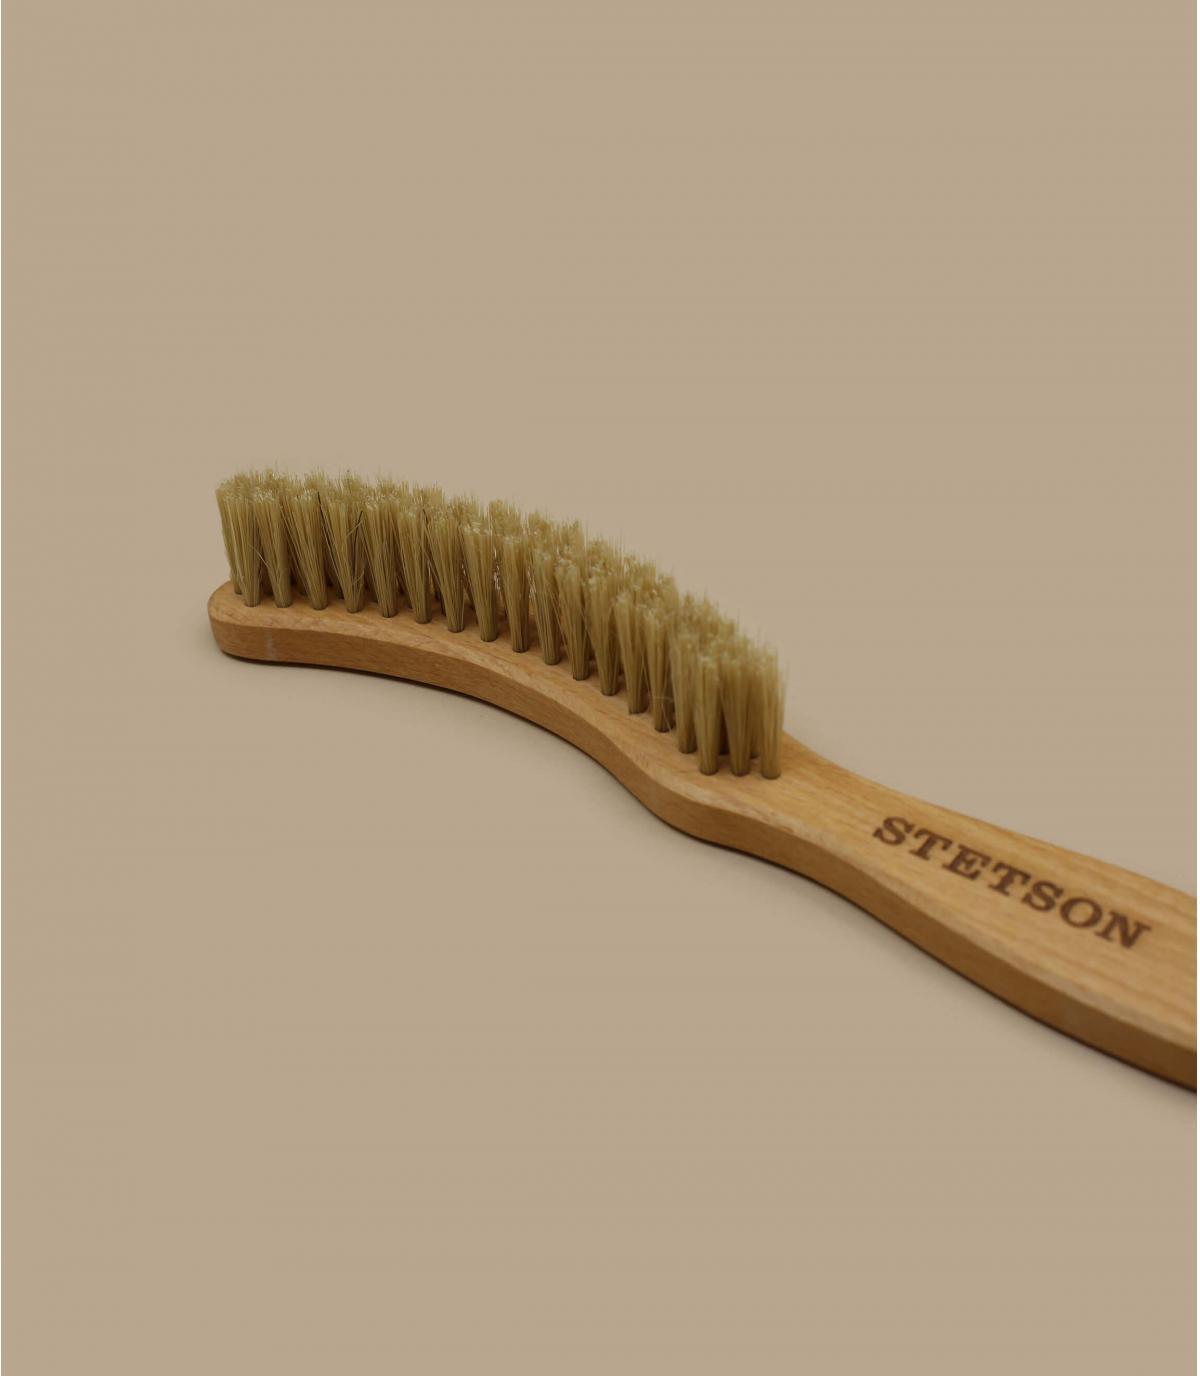 Dettagli Brush - image 2